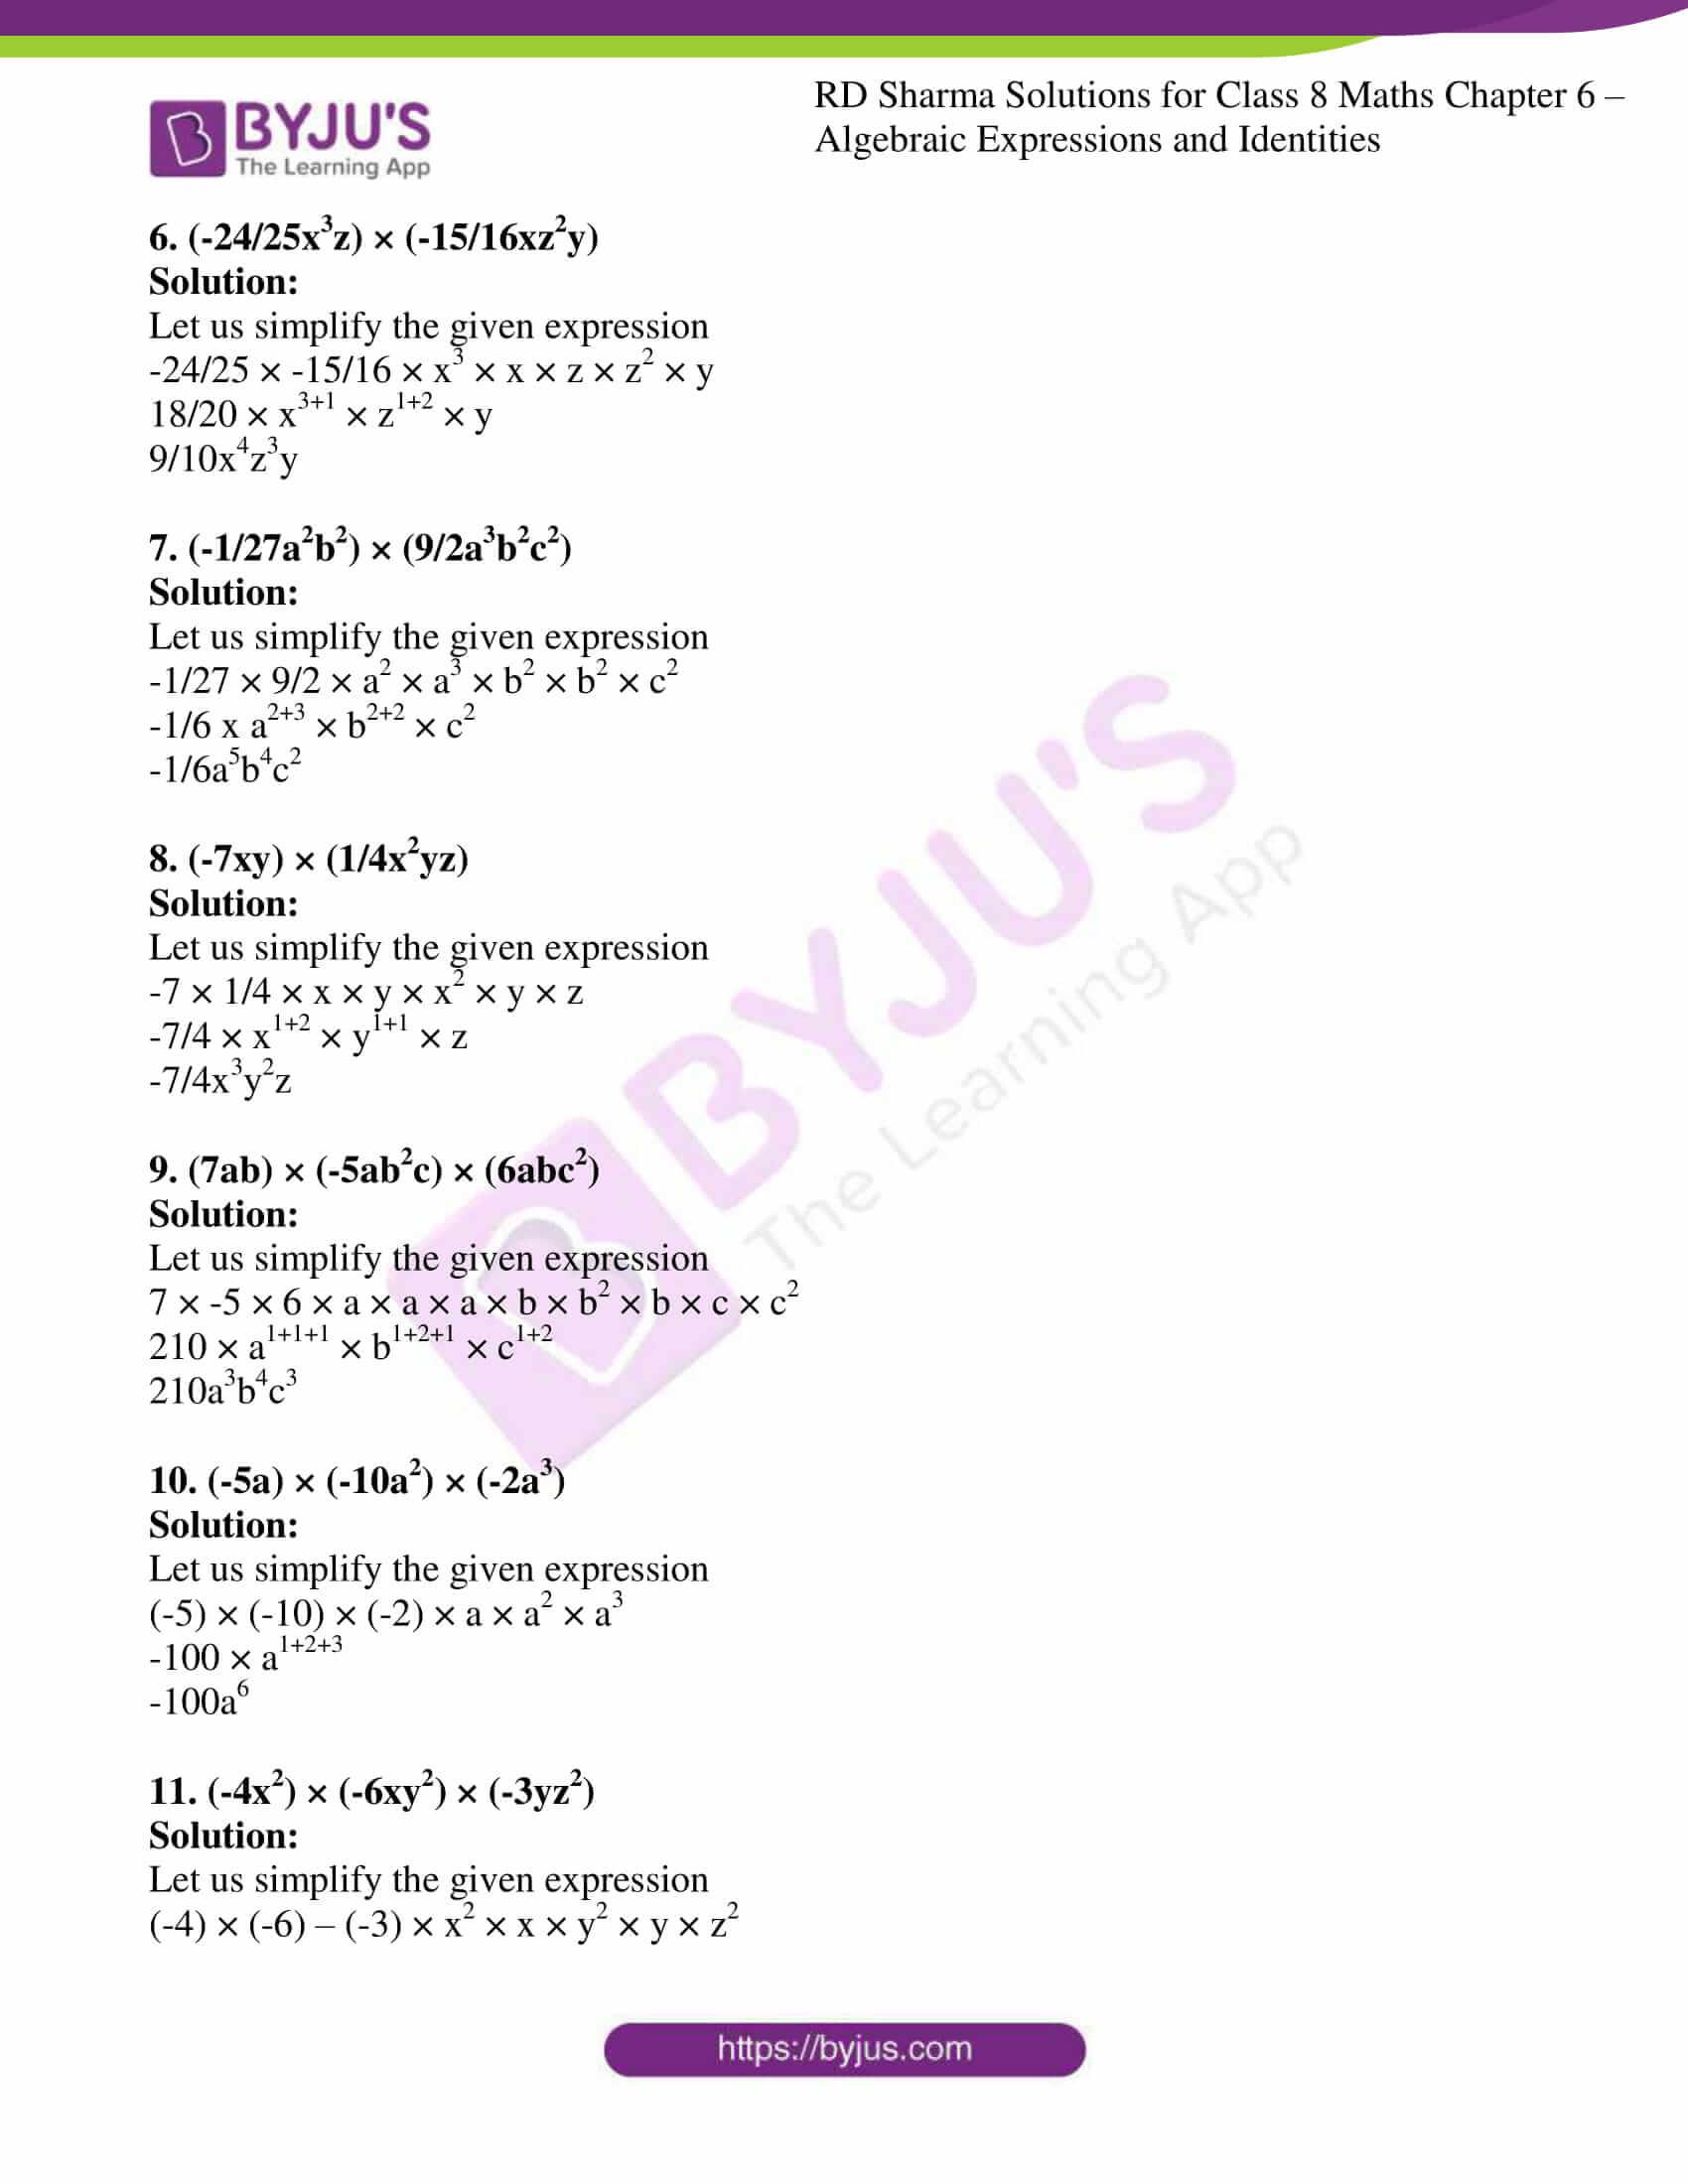 rd sharma class 8 maths chapter 6 exercise 3 2